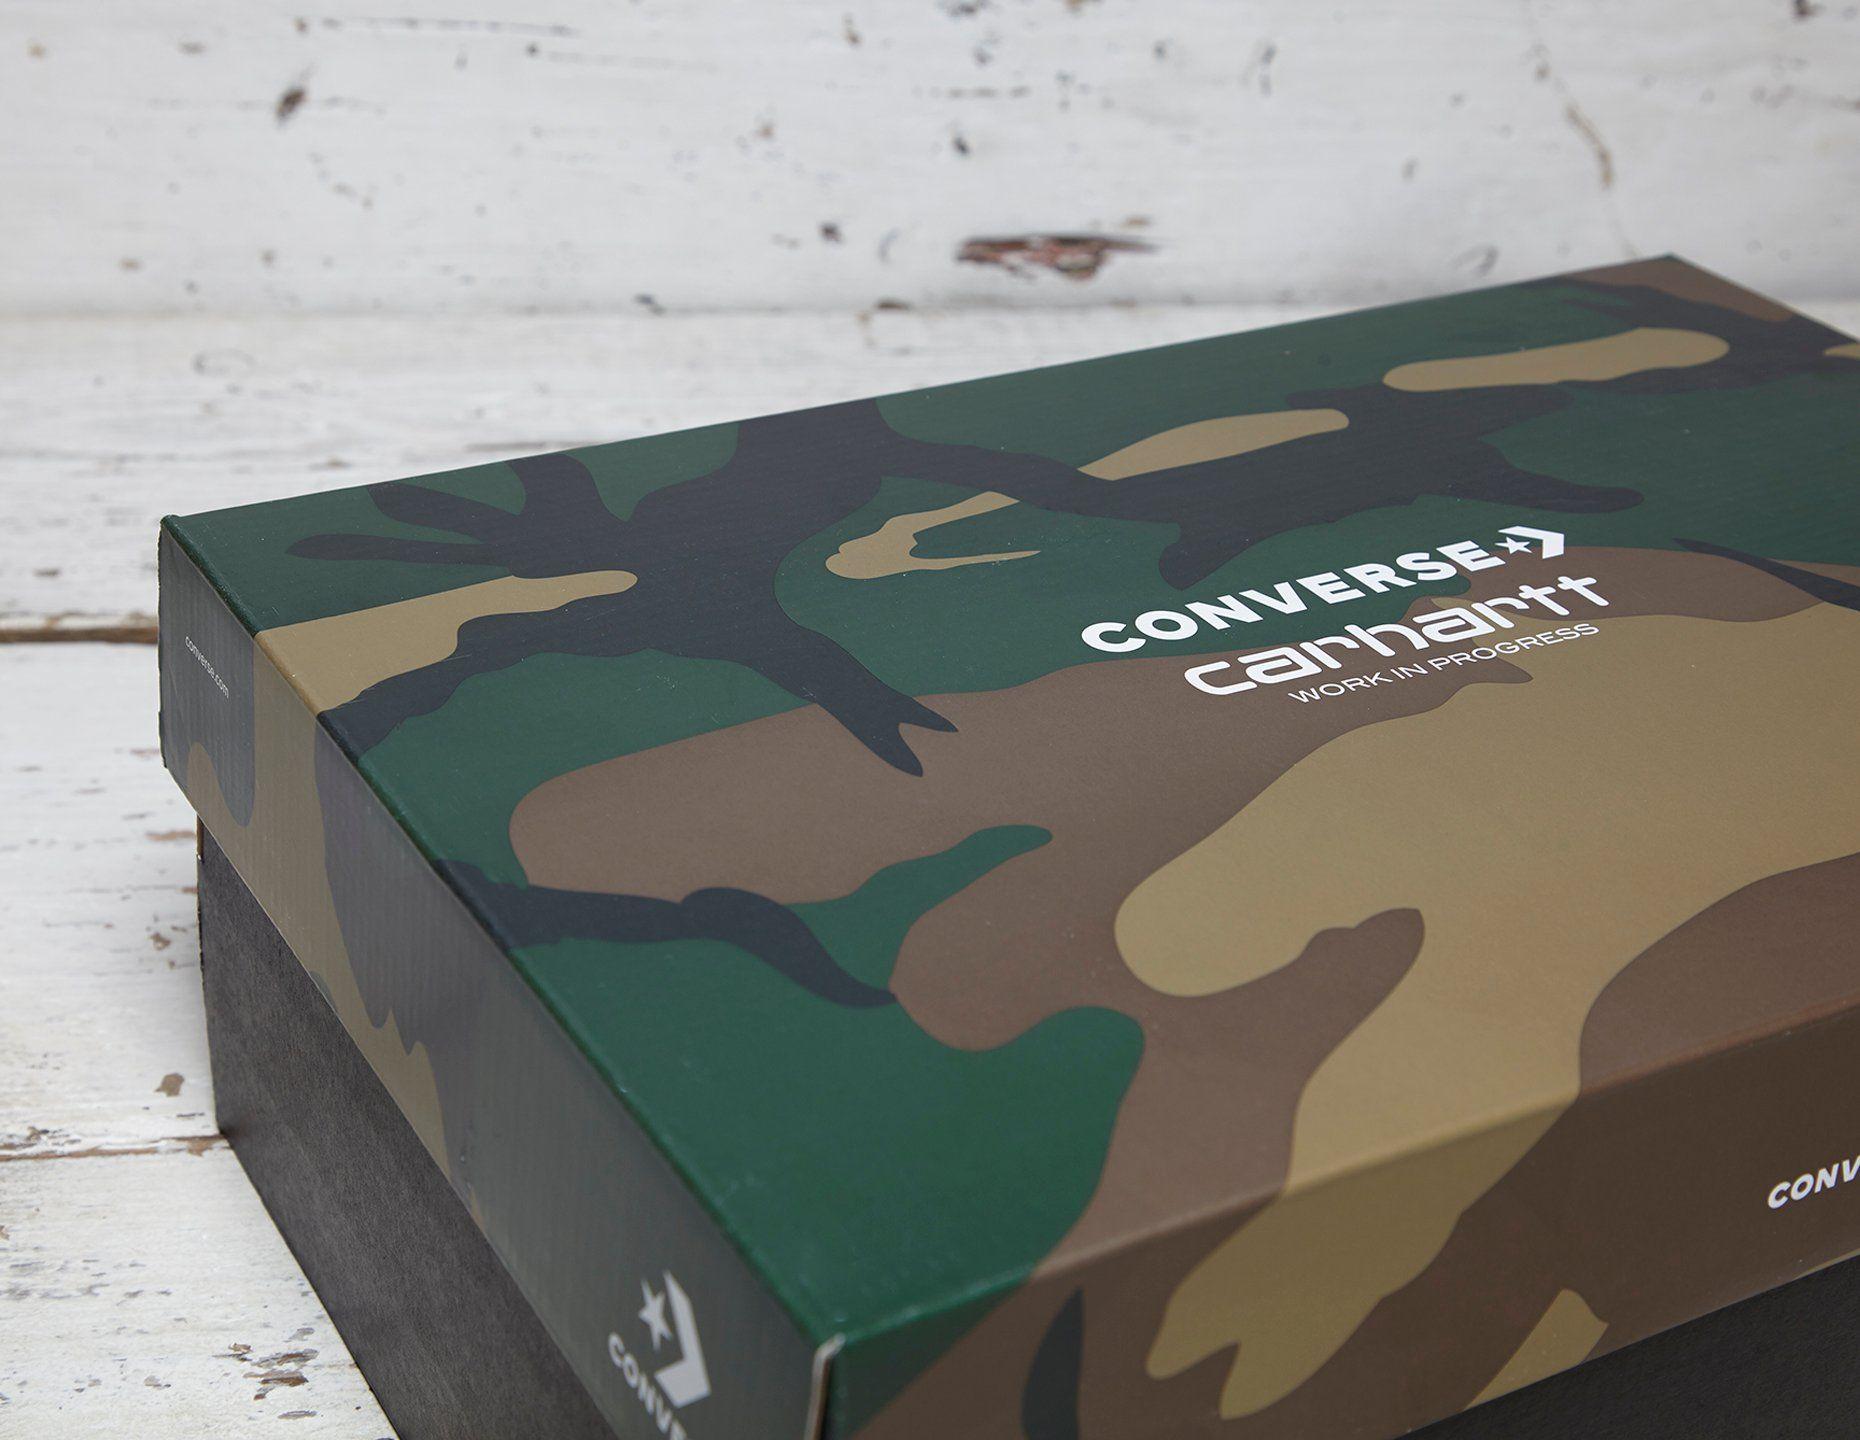 Converse x Carhartt WIP One Star Ox